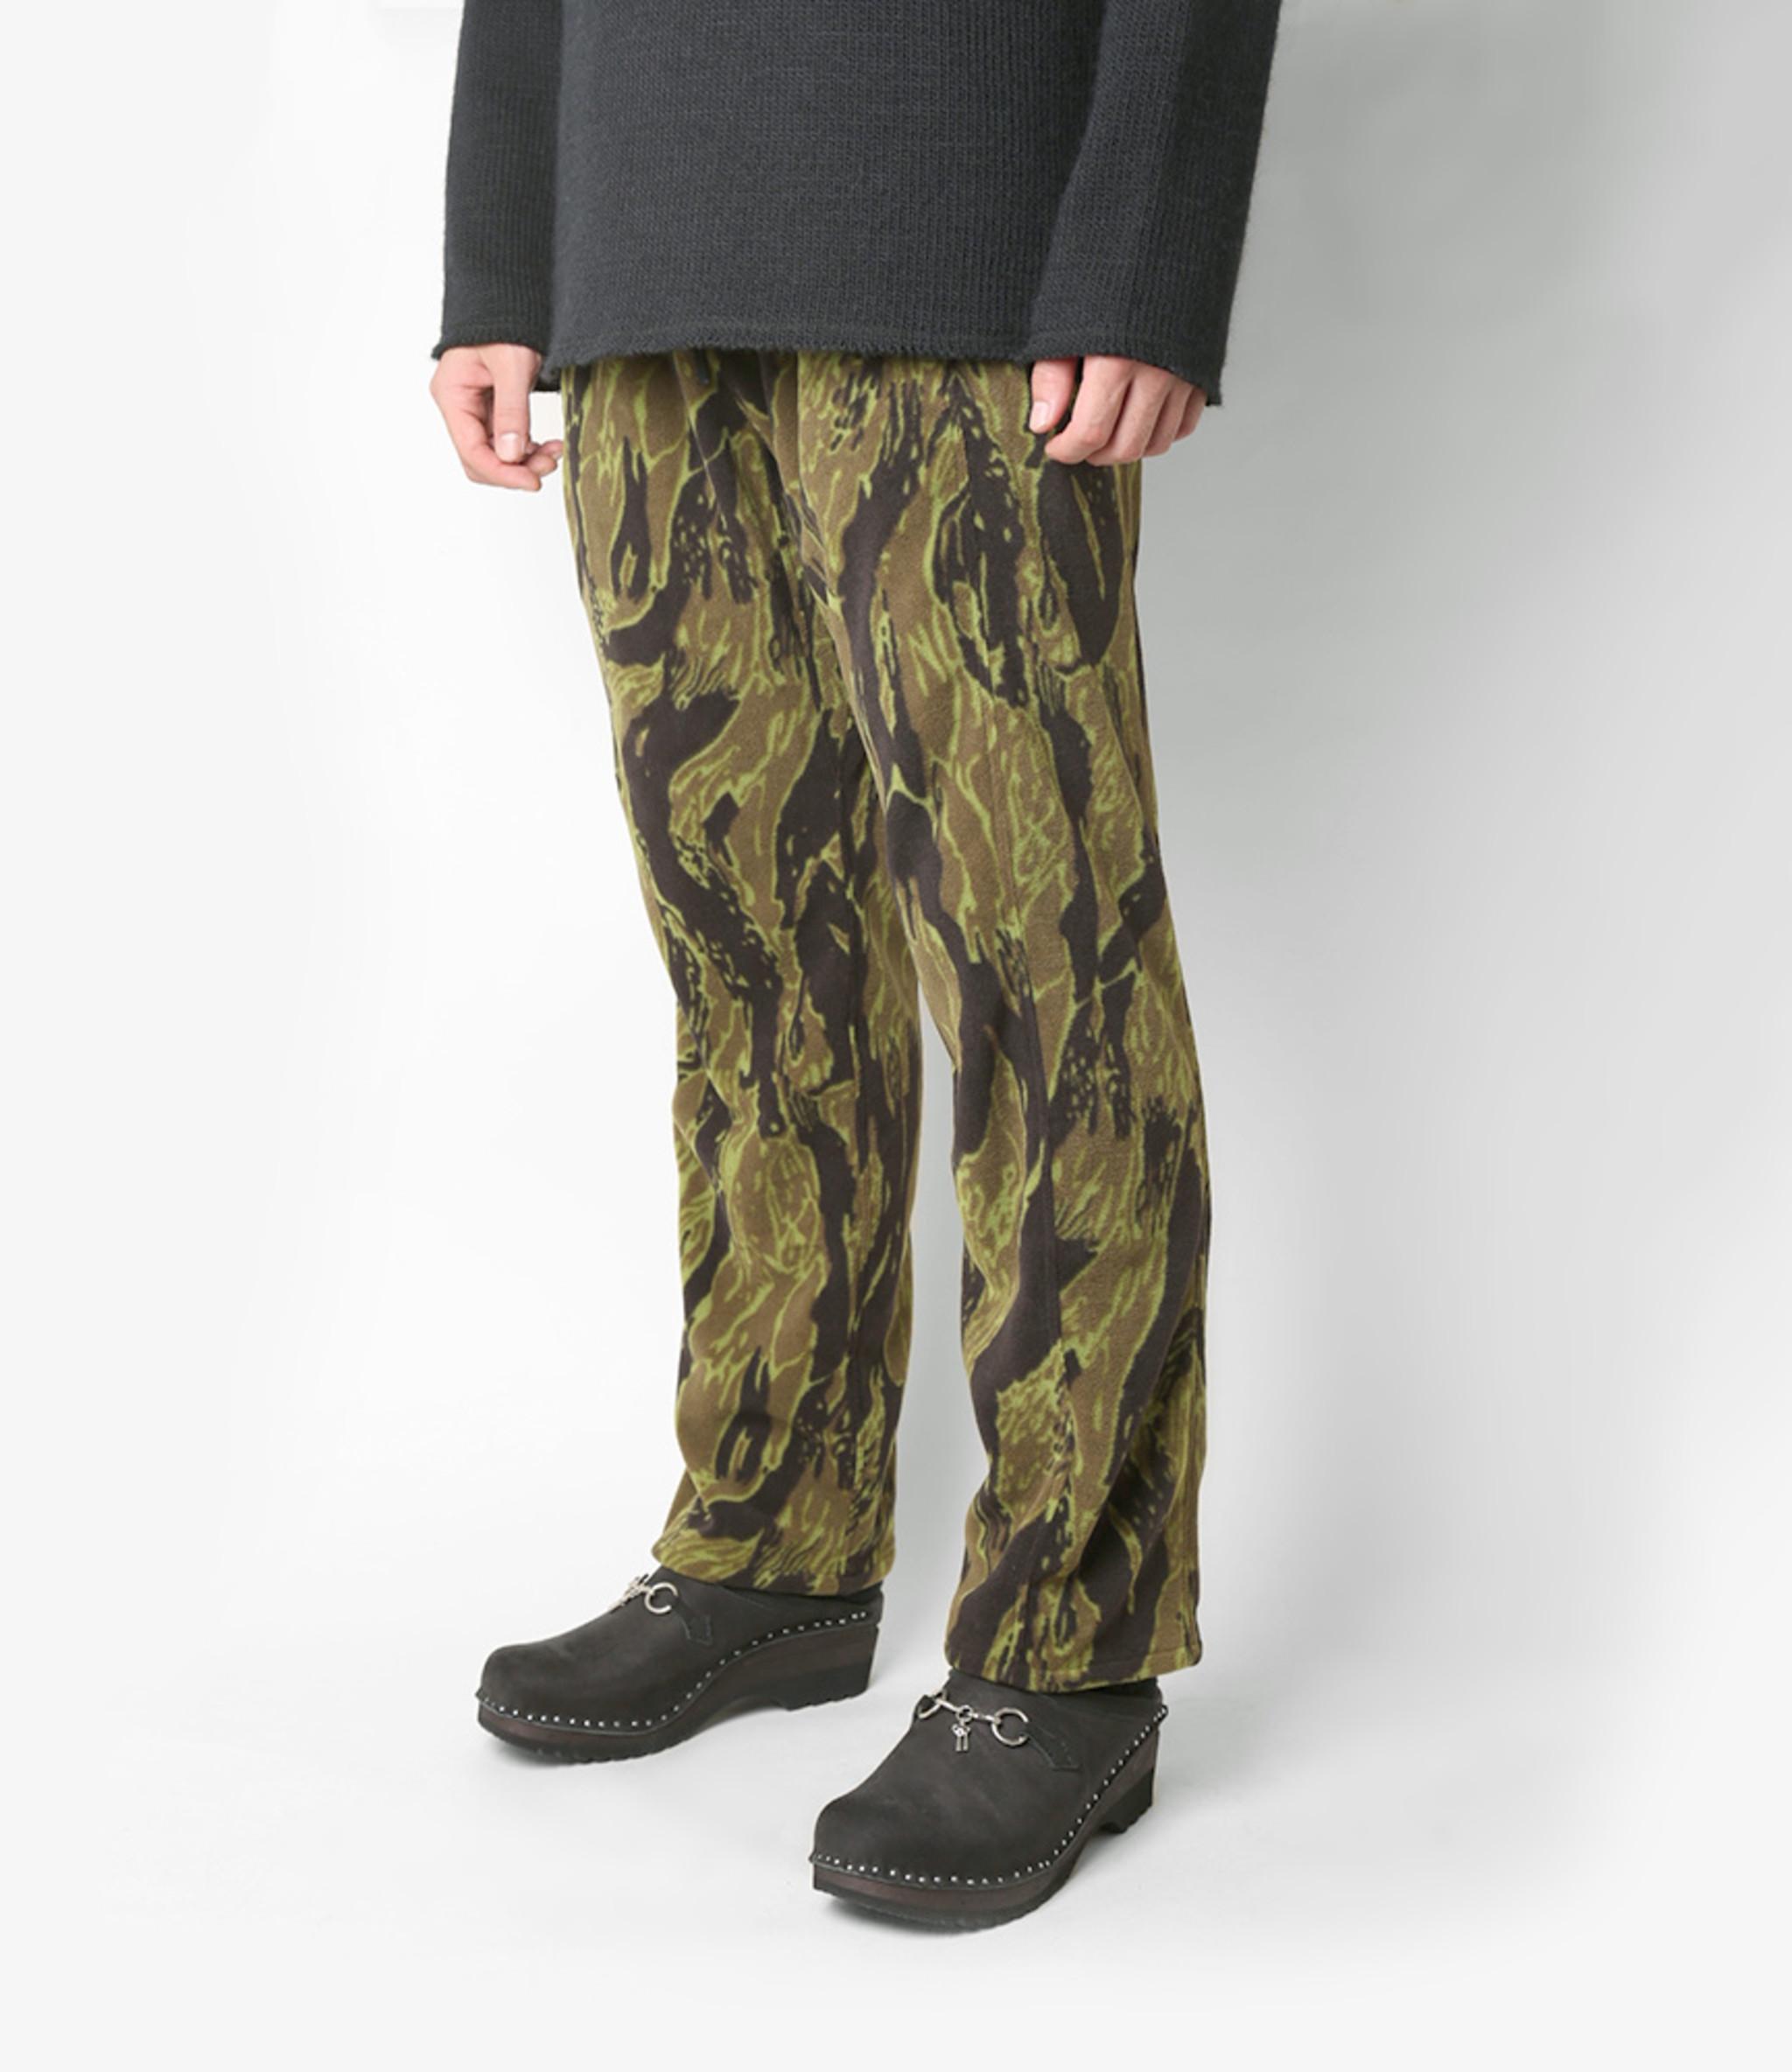 Needles Seam Pocket Pant - Poly Fleece / Tiger Camo Stripe